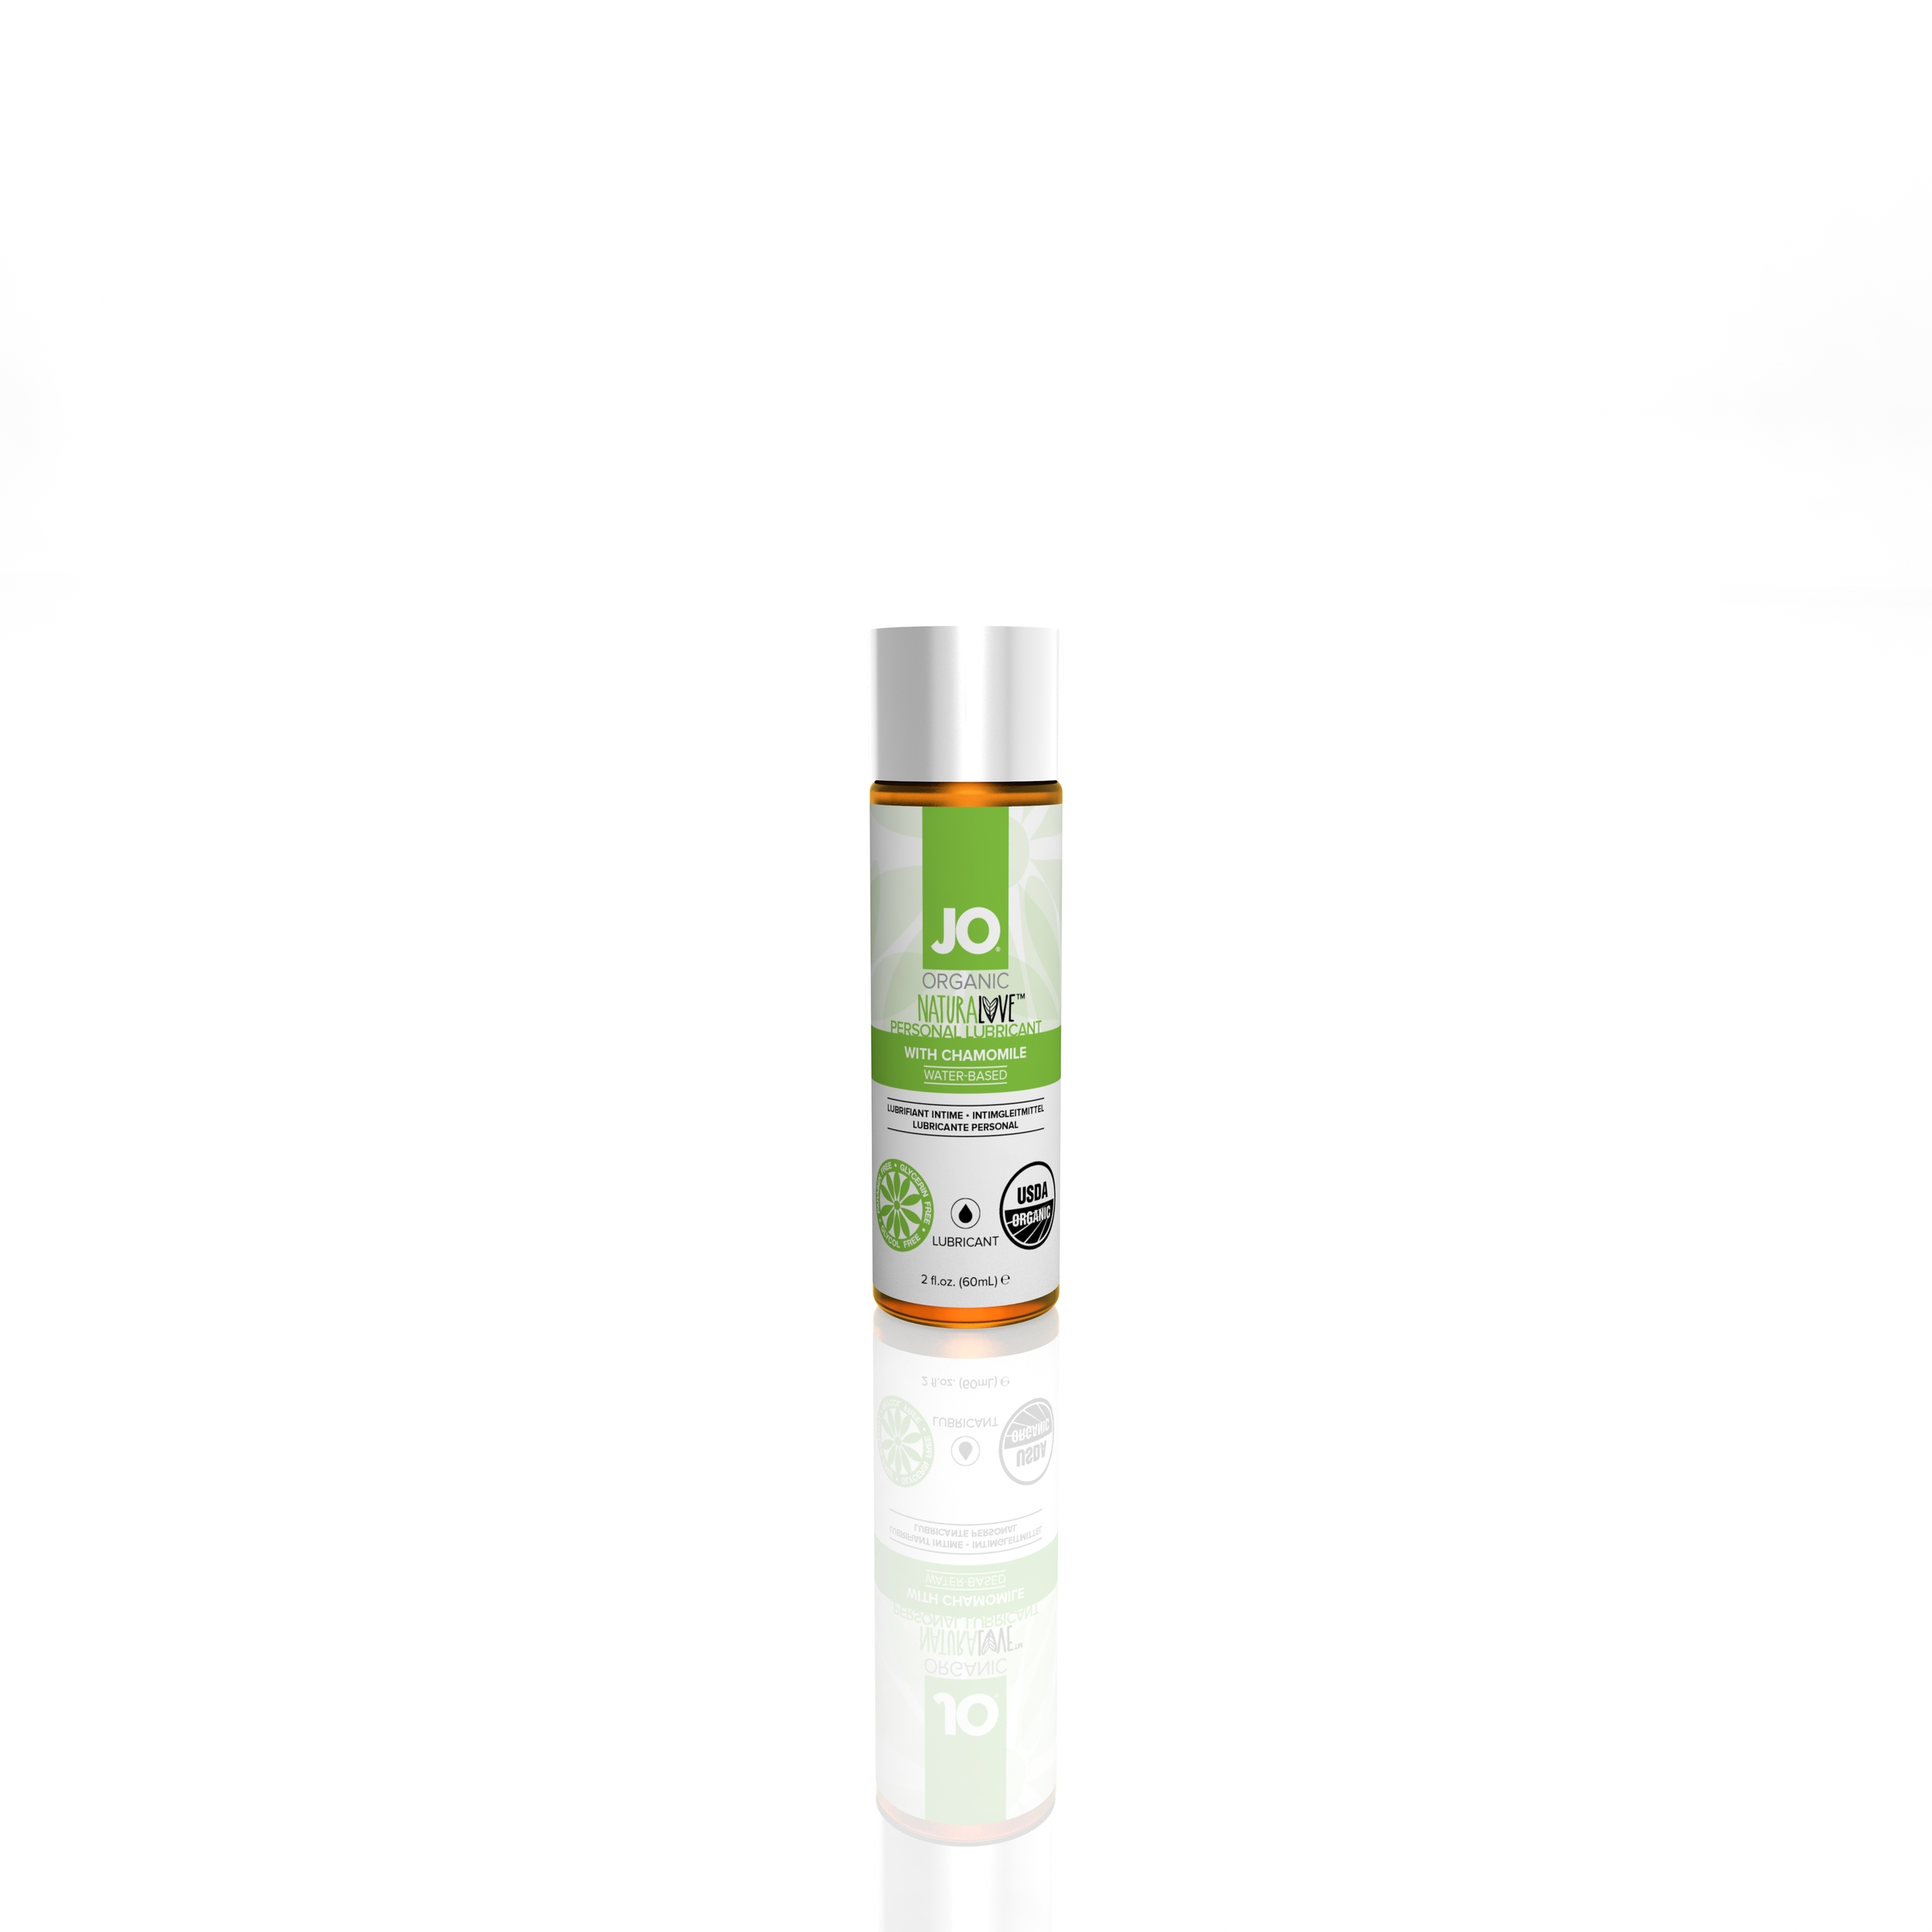 JO USDA Organic 2oz Original Lubricant (straight on) (white)001.jpg